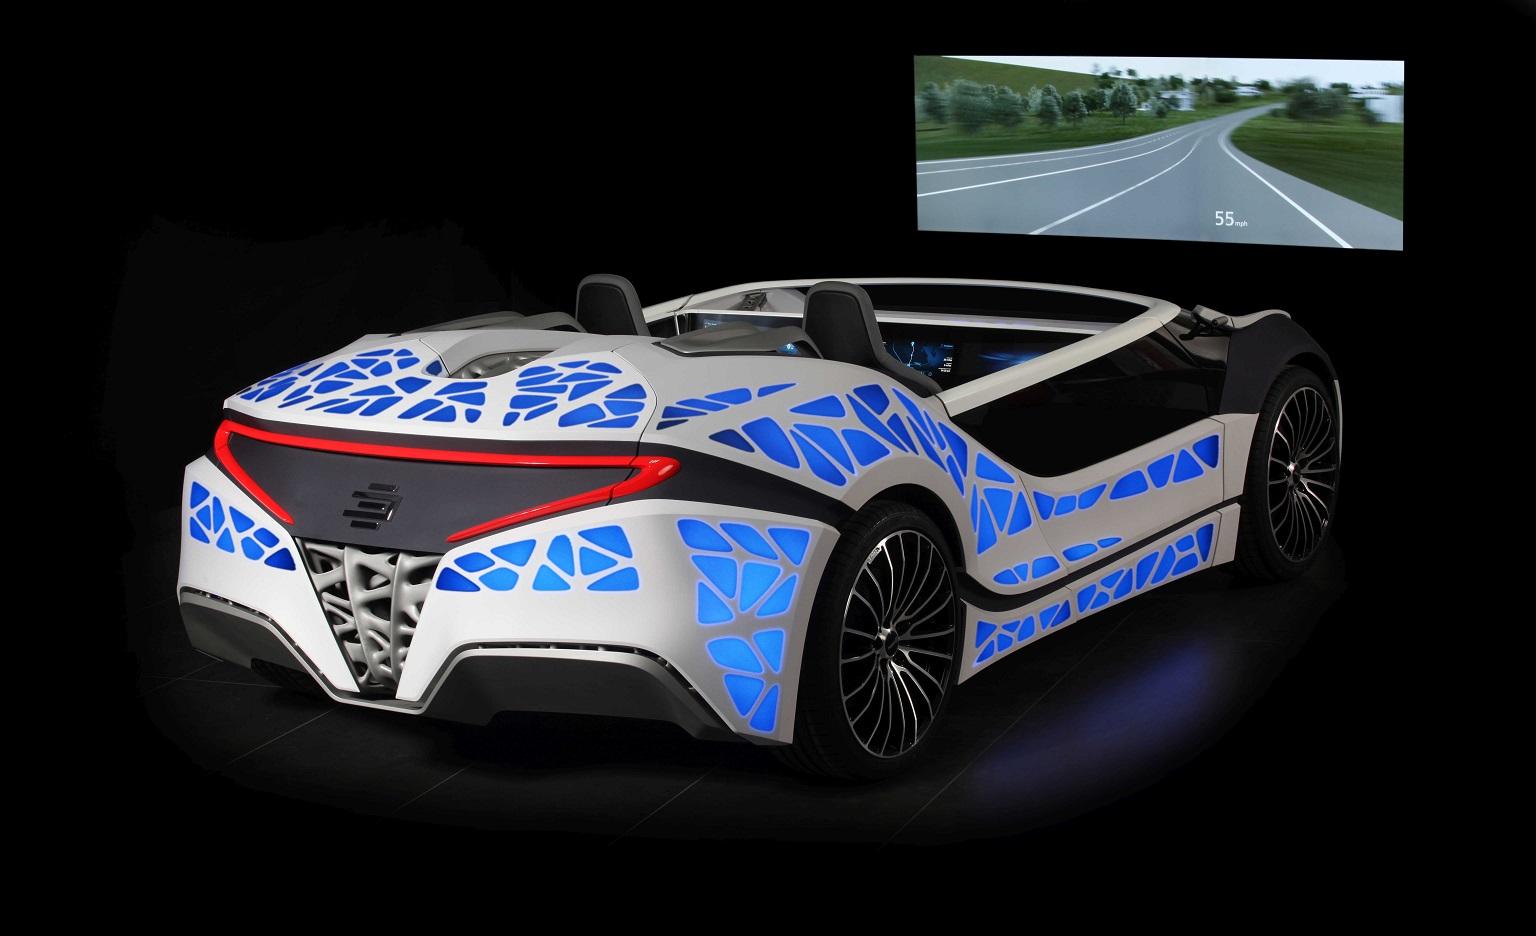 fabrication-additive-automobile